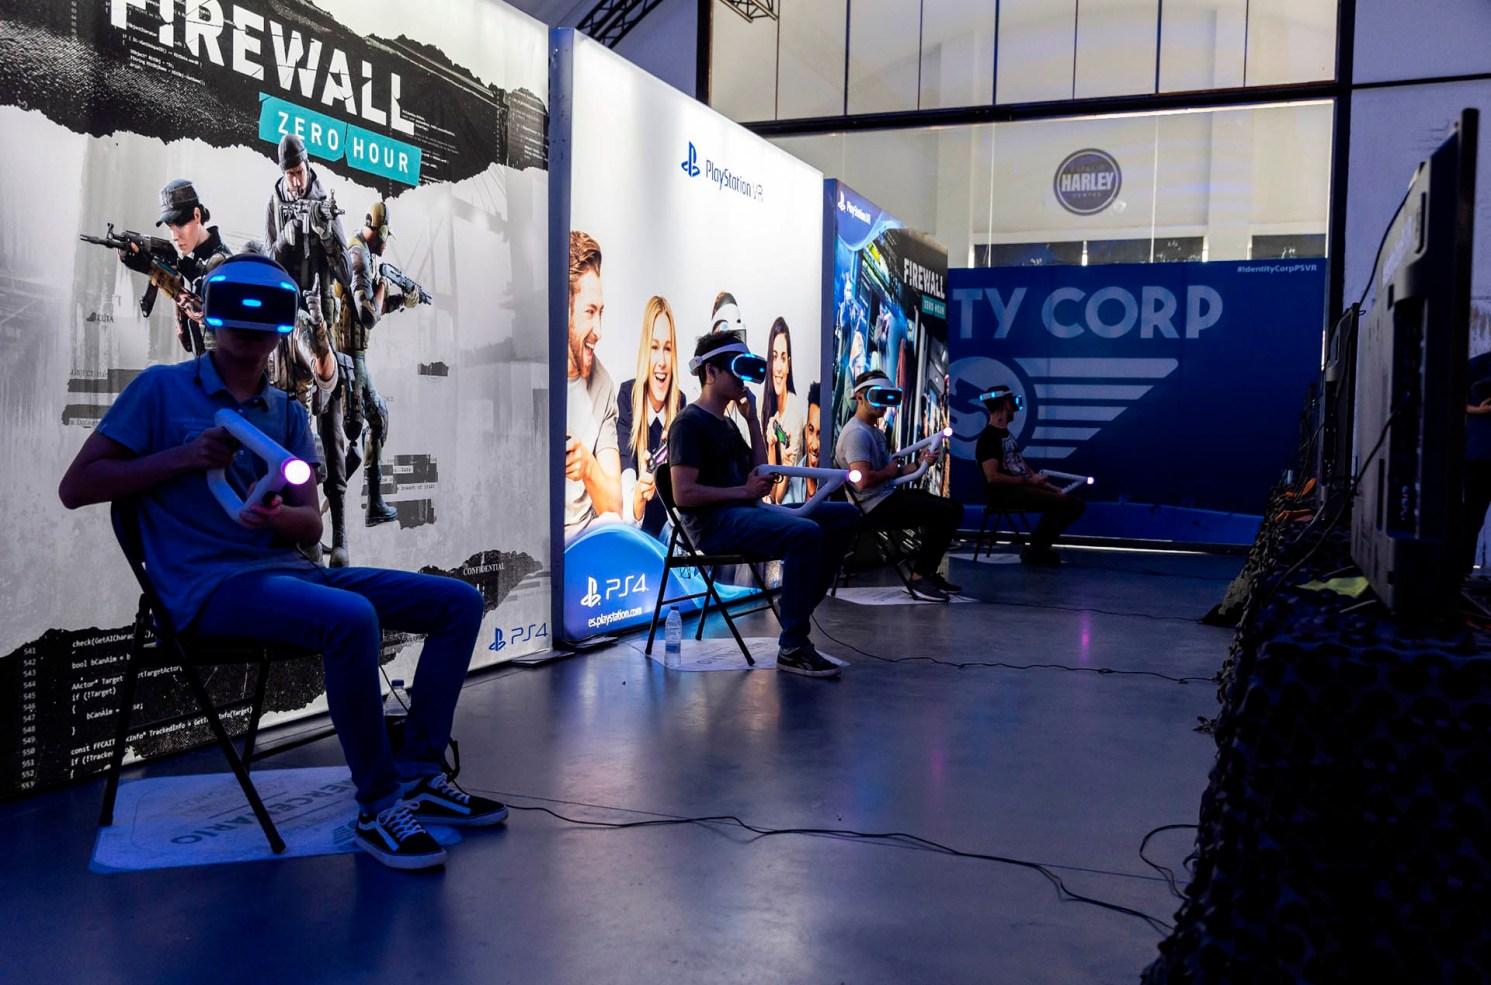 Identity Corp PlayStation VR